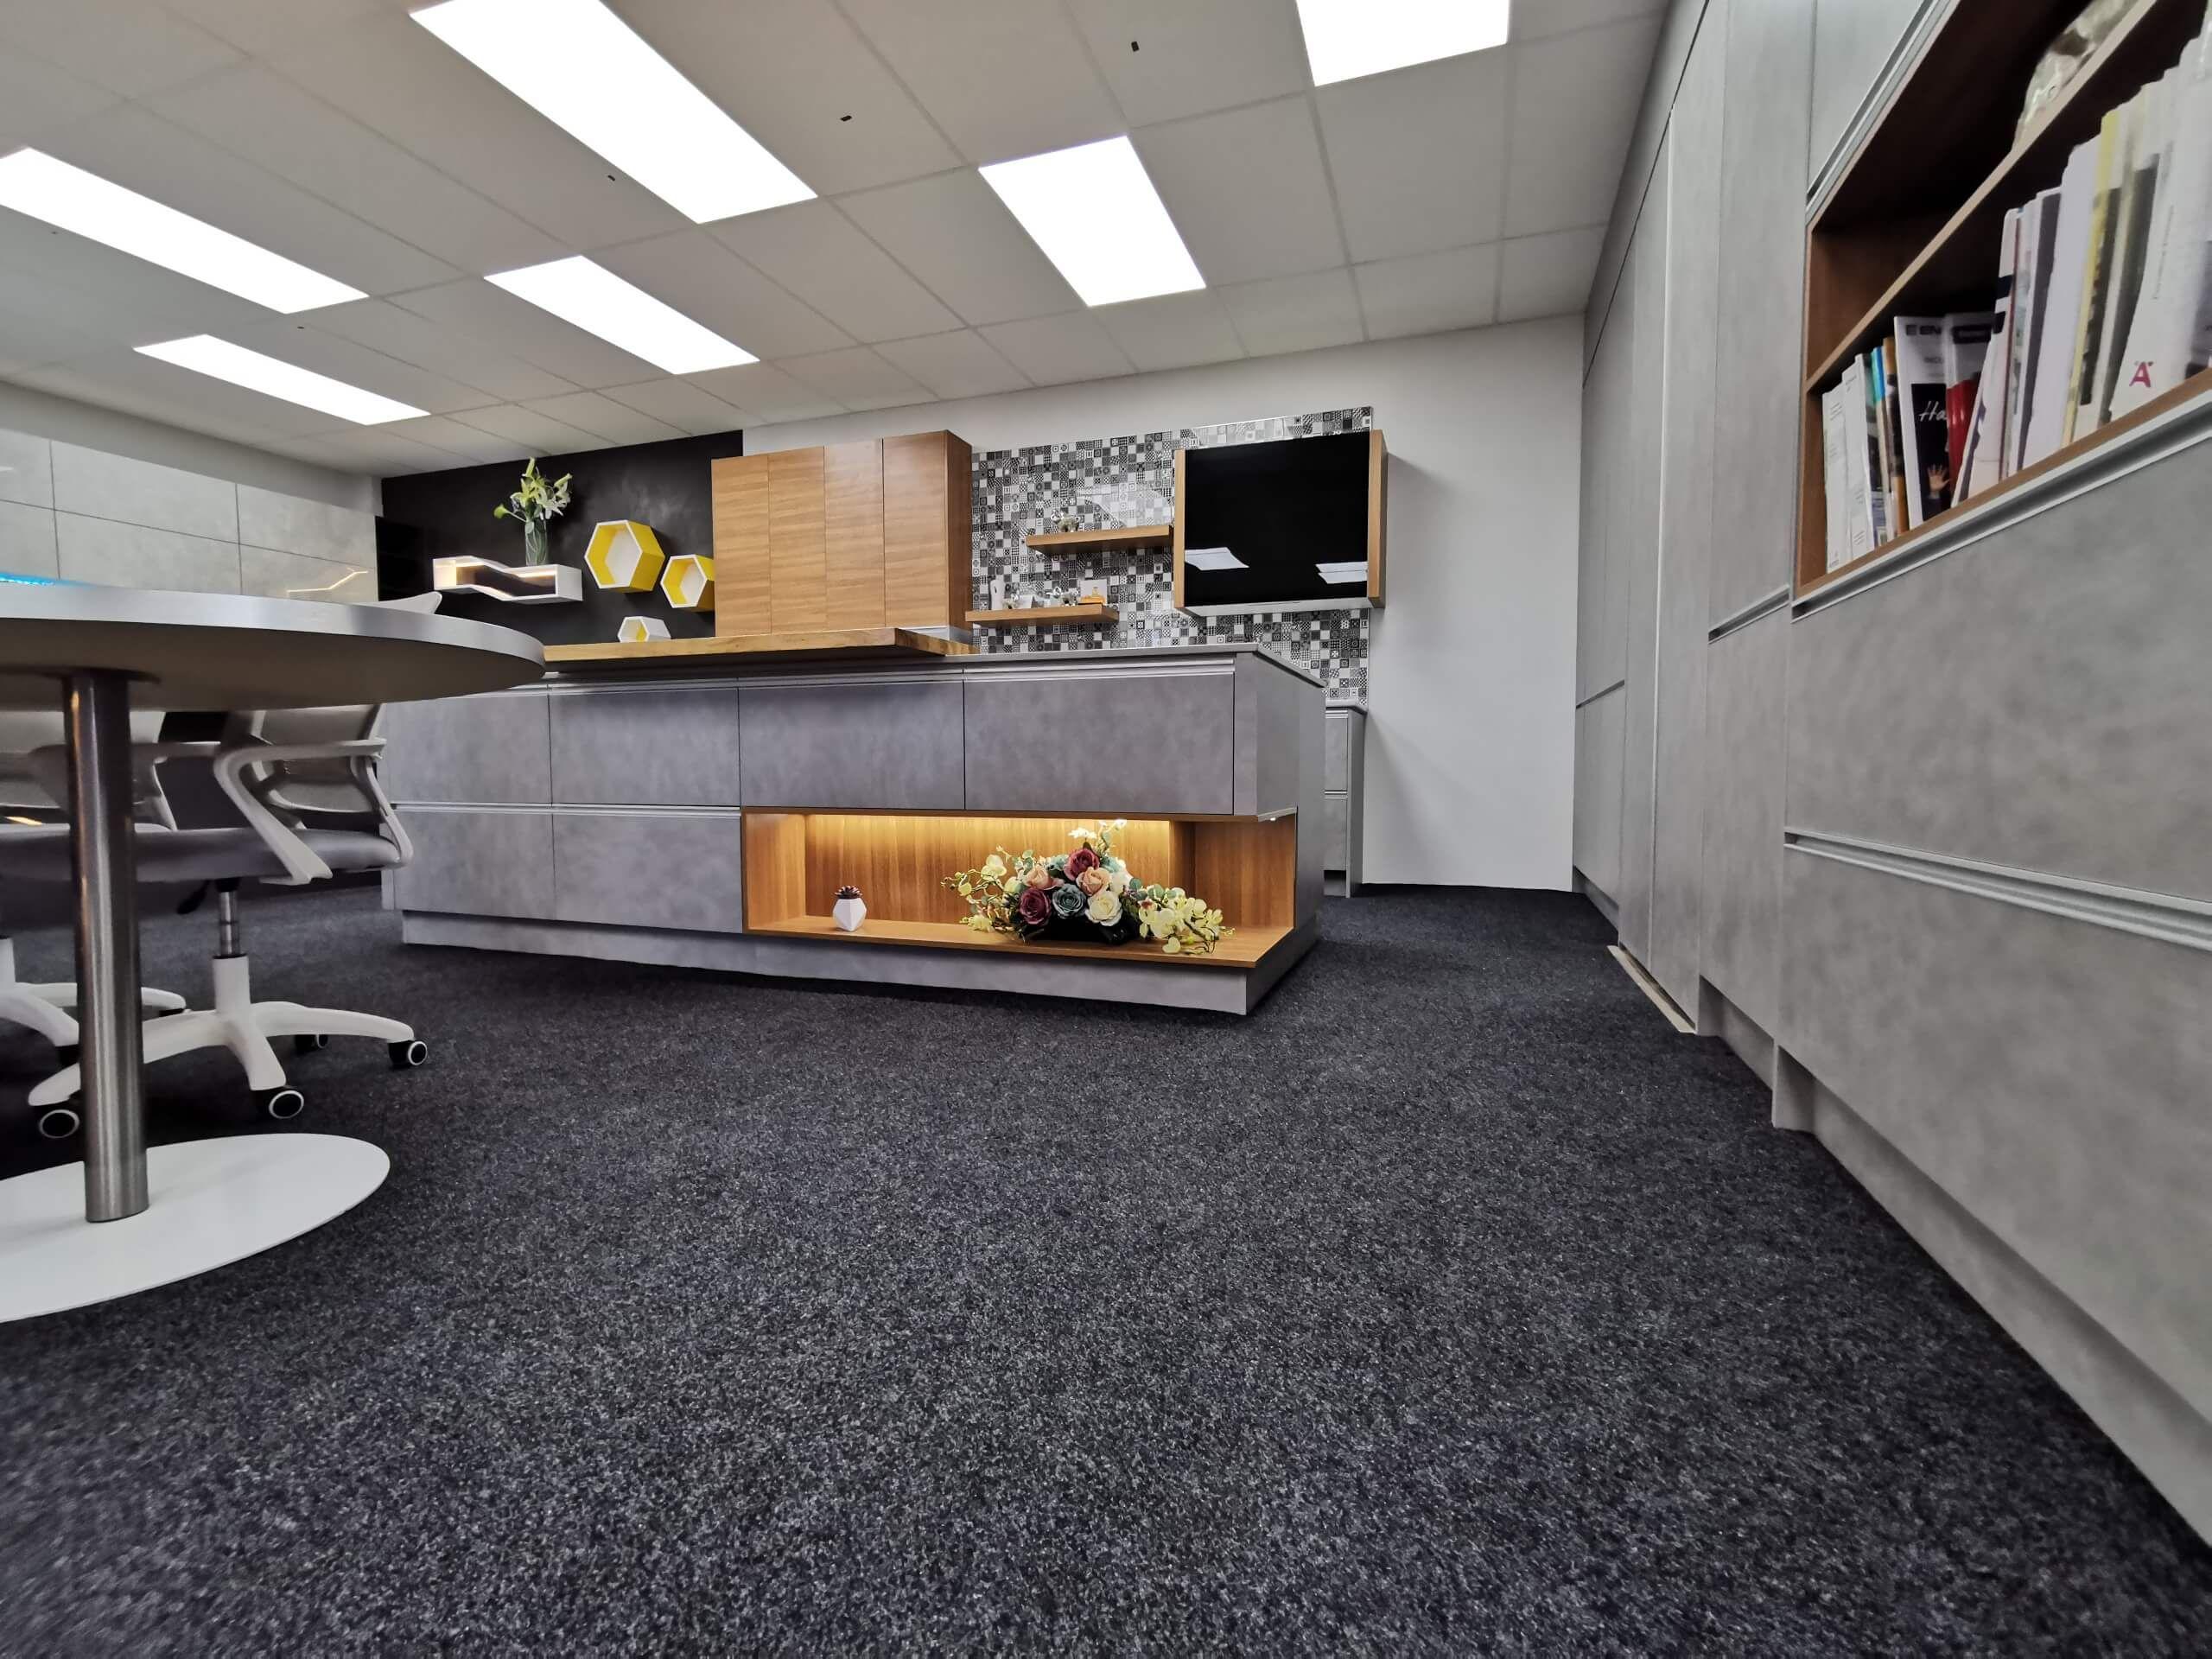 kitchen design christchurch in new zealand in 2020